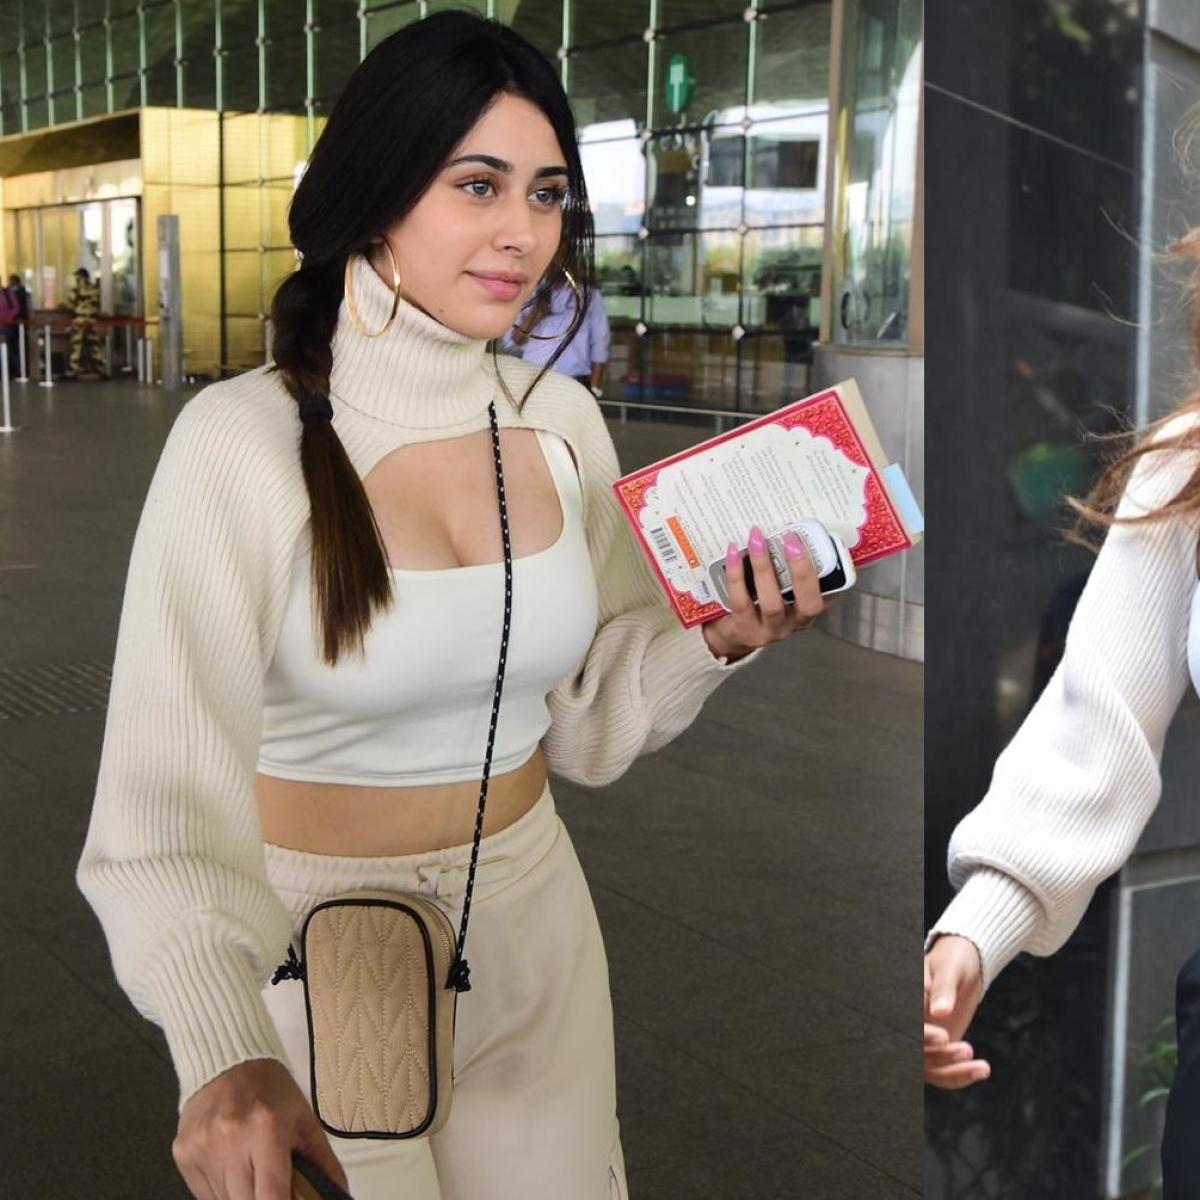 Warina Hussain Vs Disha Patani - who wore the viral high neck super crop sweater better?